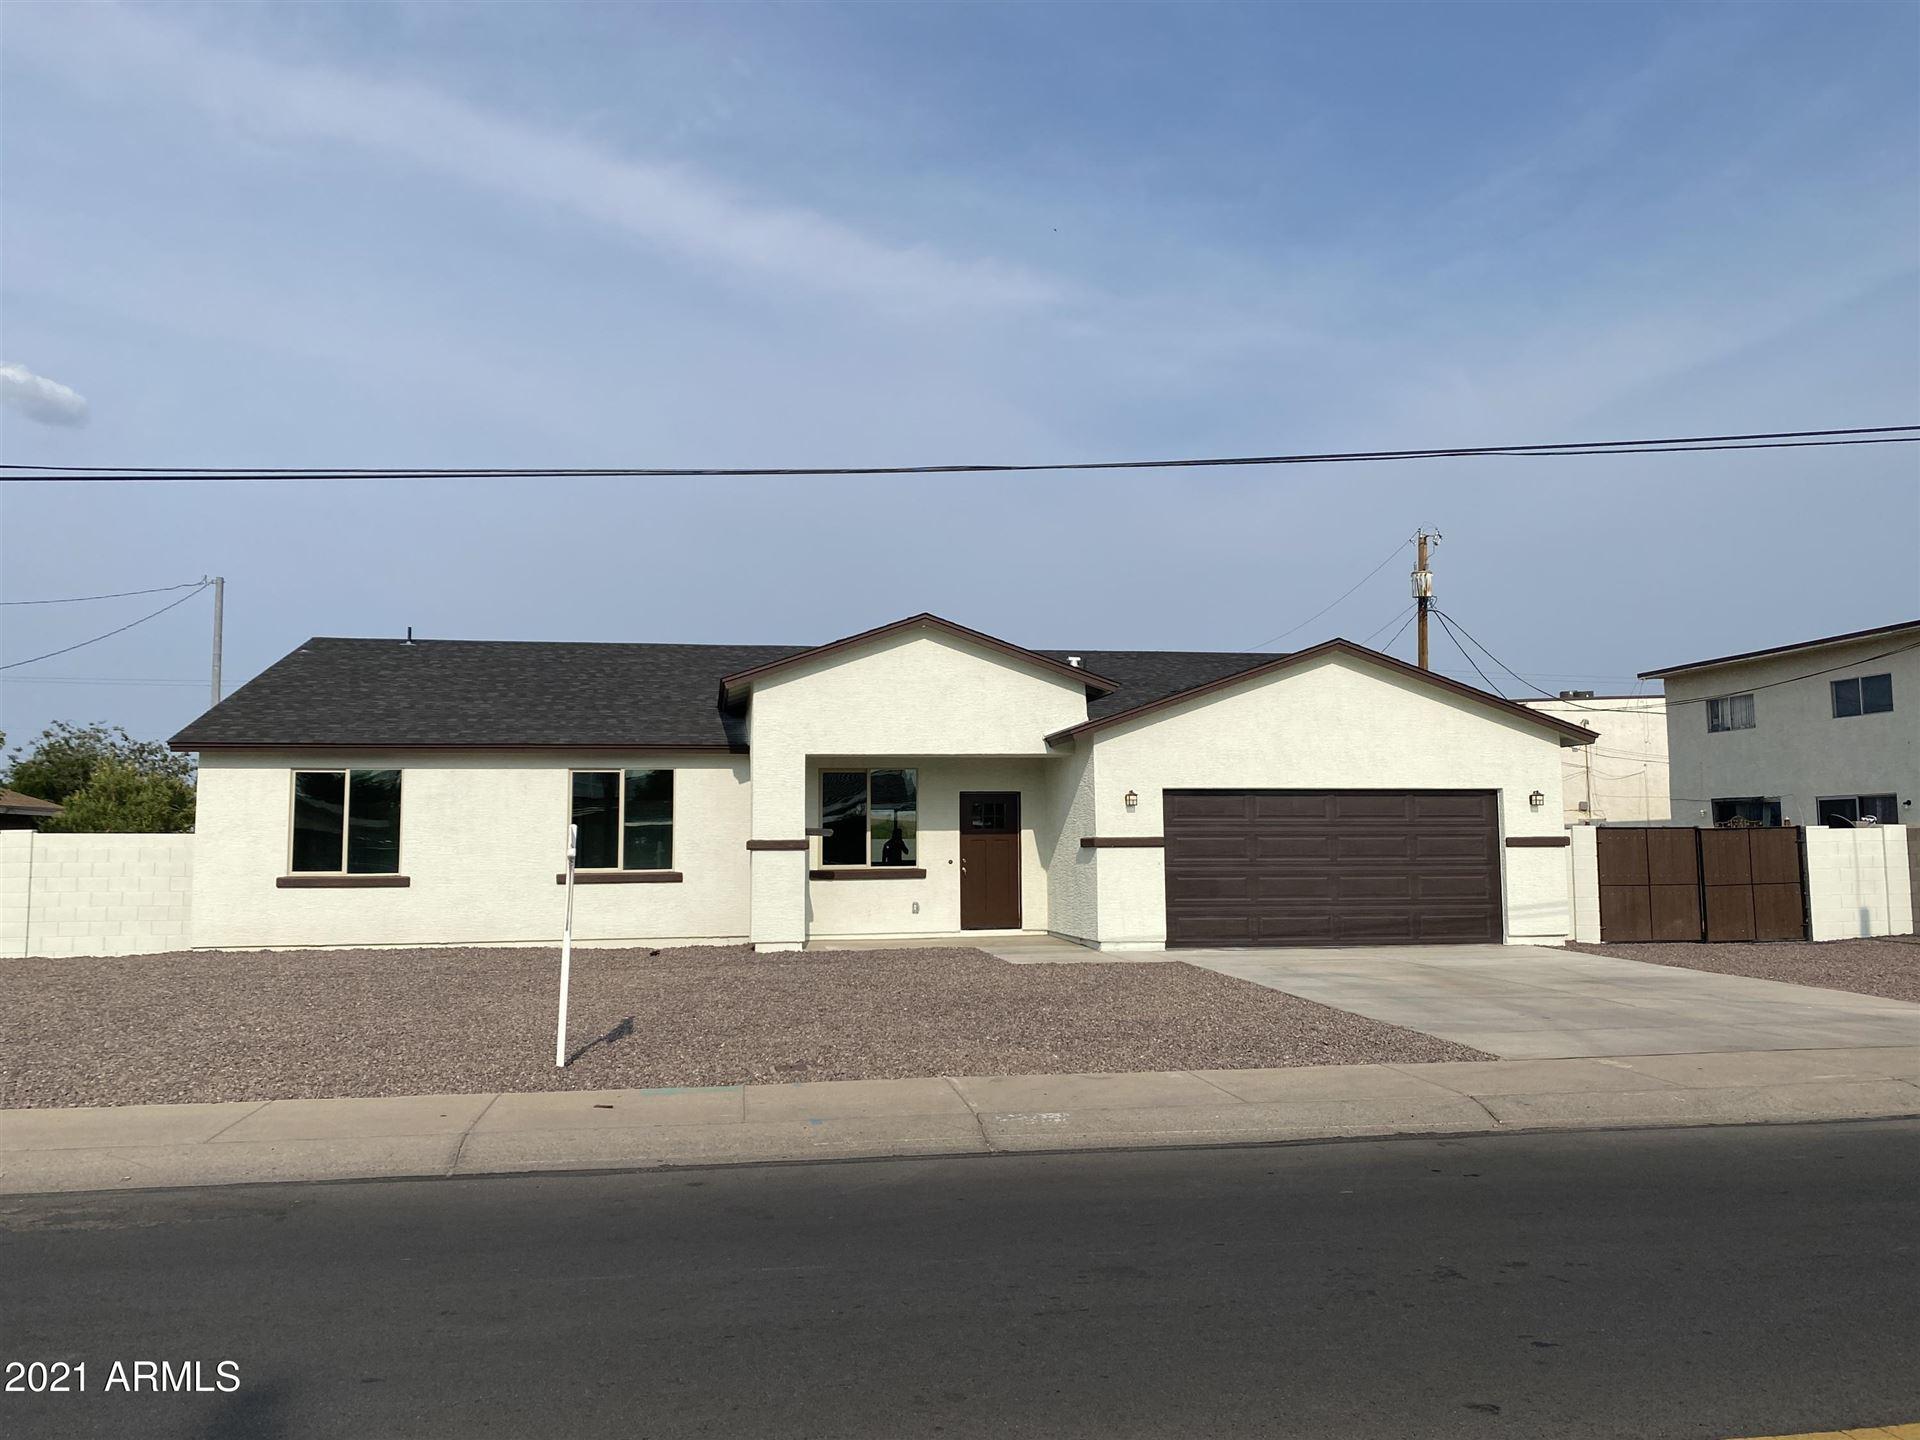 Photo of 13213 N A Street, El Mirage, AZ 85335 (MLS # 6268770)